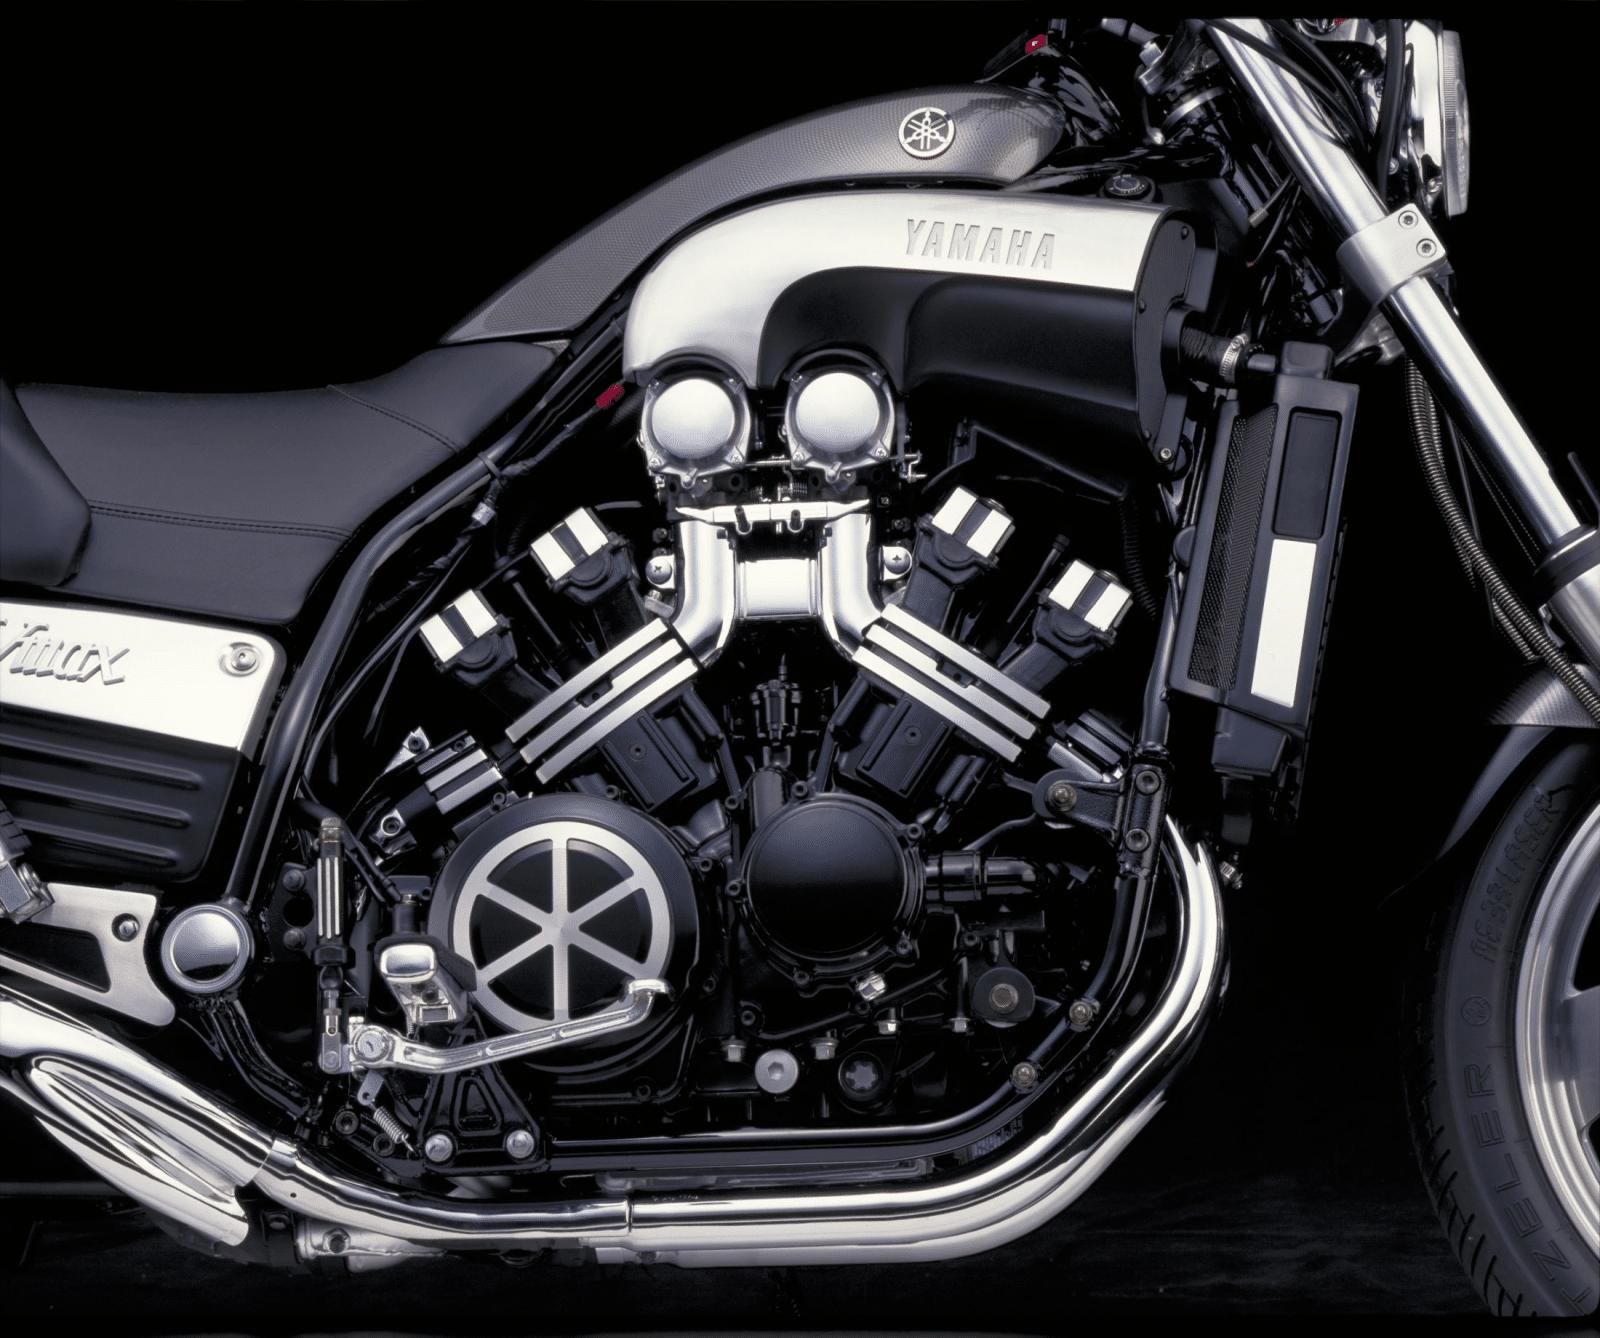 Yamaha V-Max 1200 2001